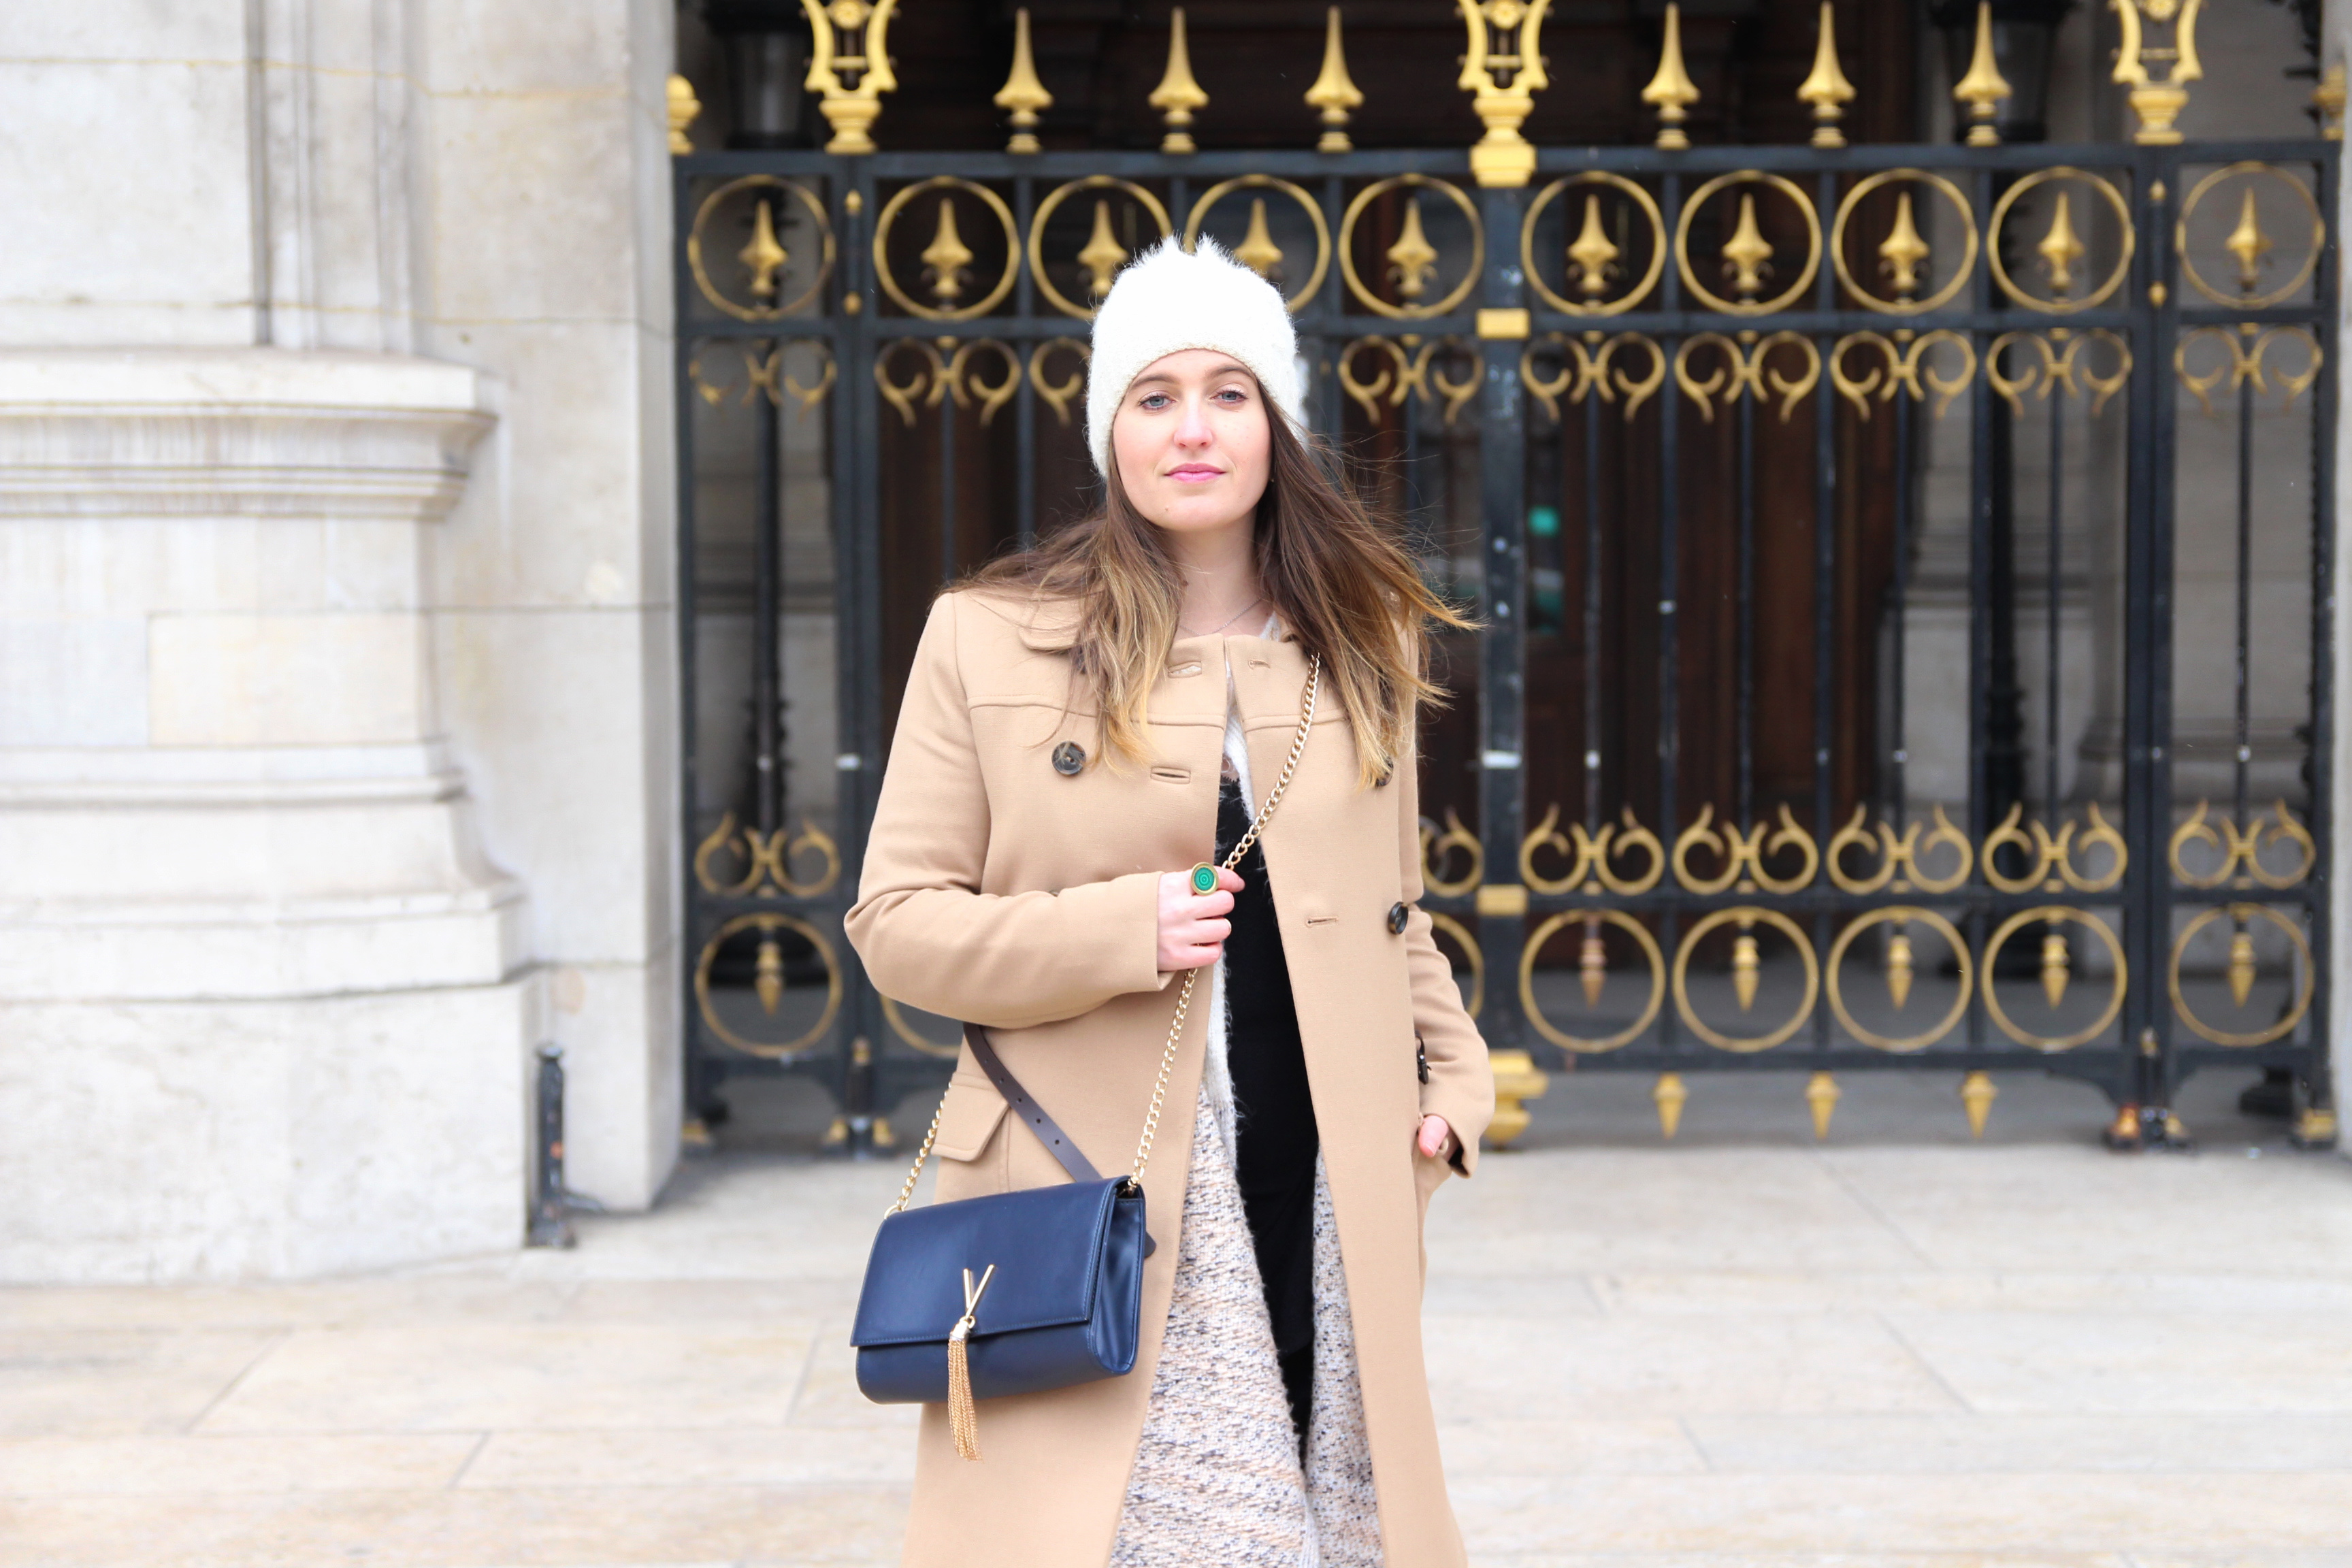 paris-opera-garnier-winter-day-influencer-style-personalstylist-imageconsultant-seralynepointcom-img_6654